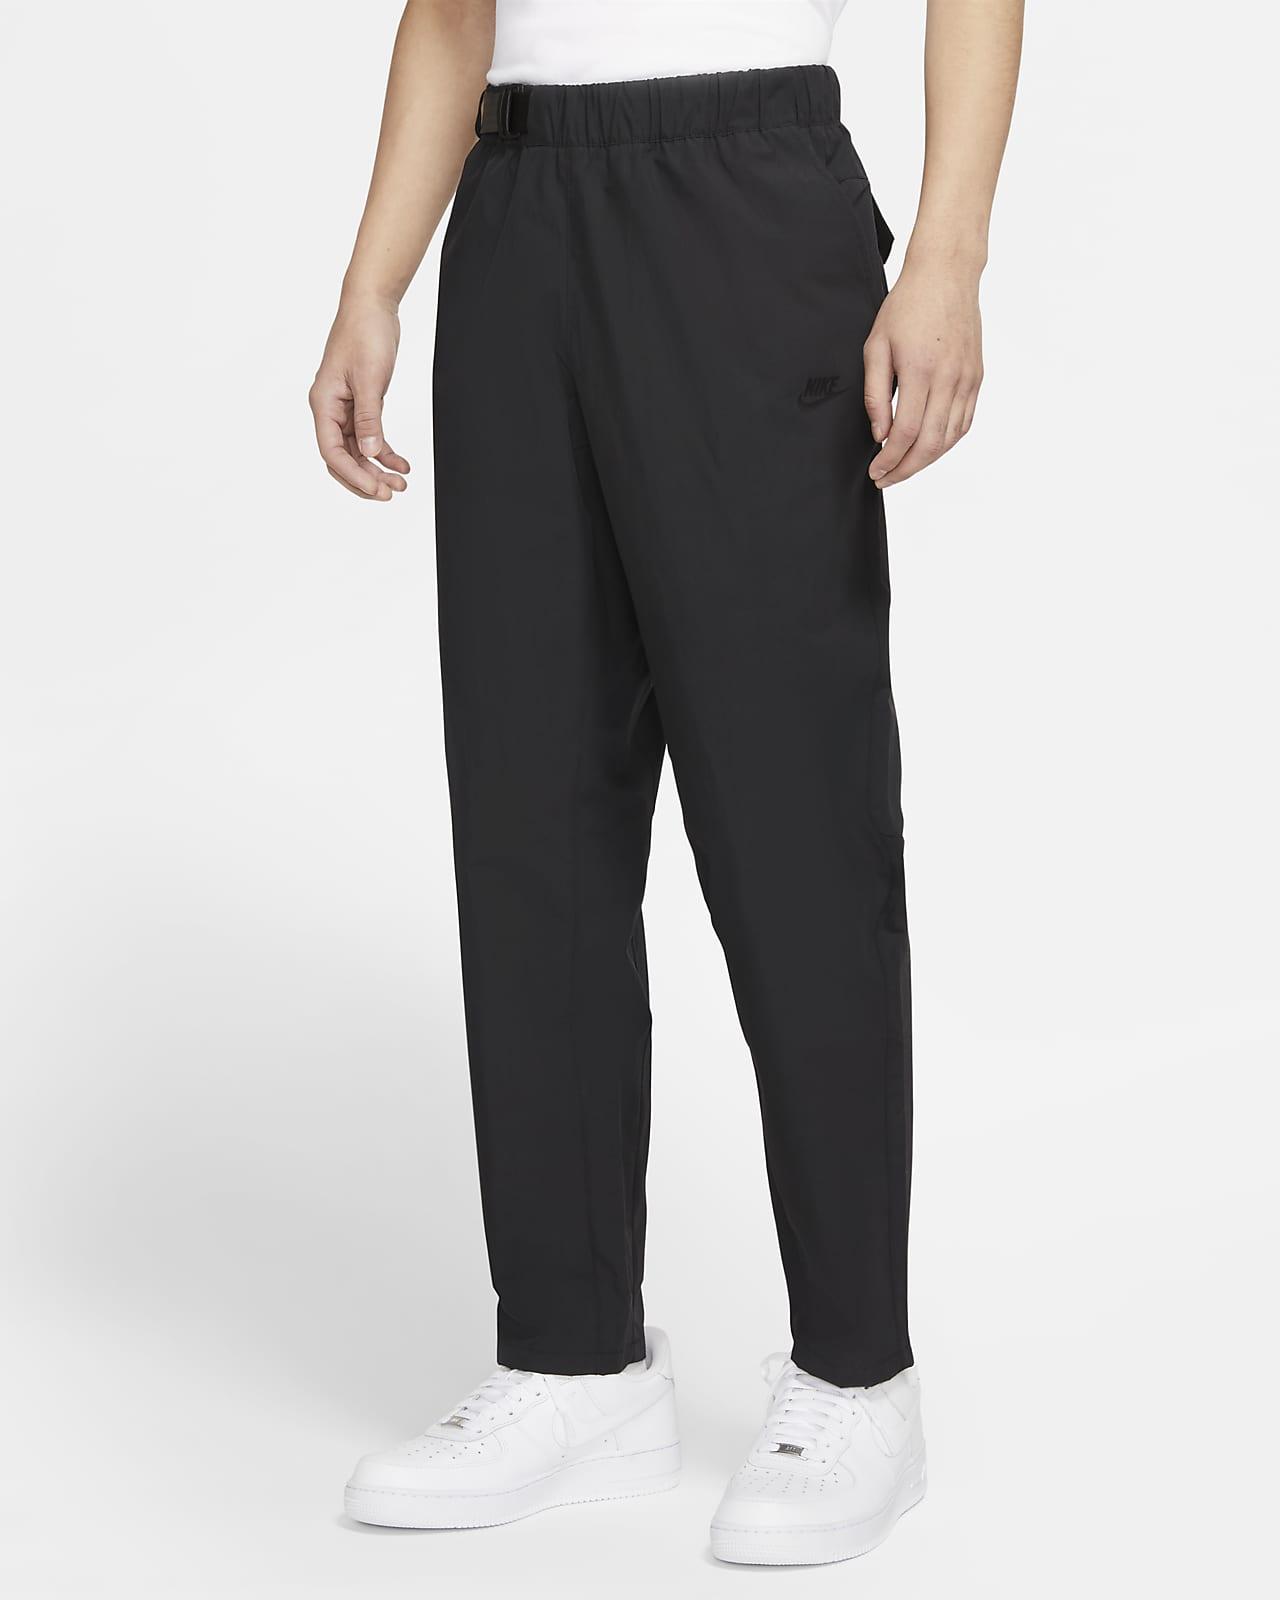 Nike Sportswear Premium Essentials Men's Woven Pants